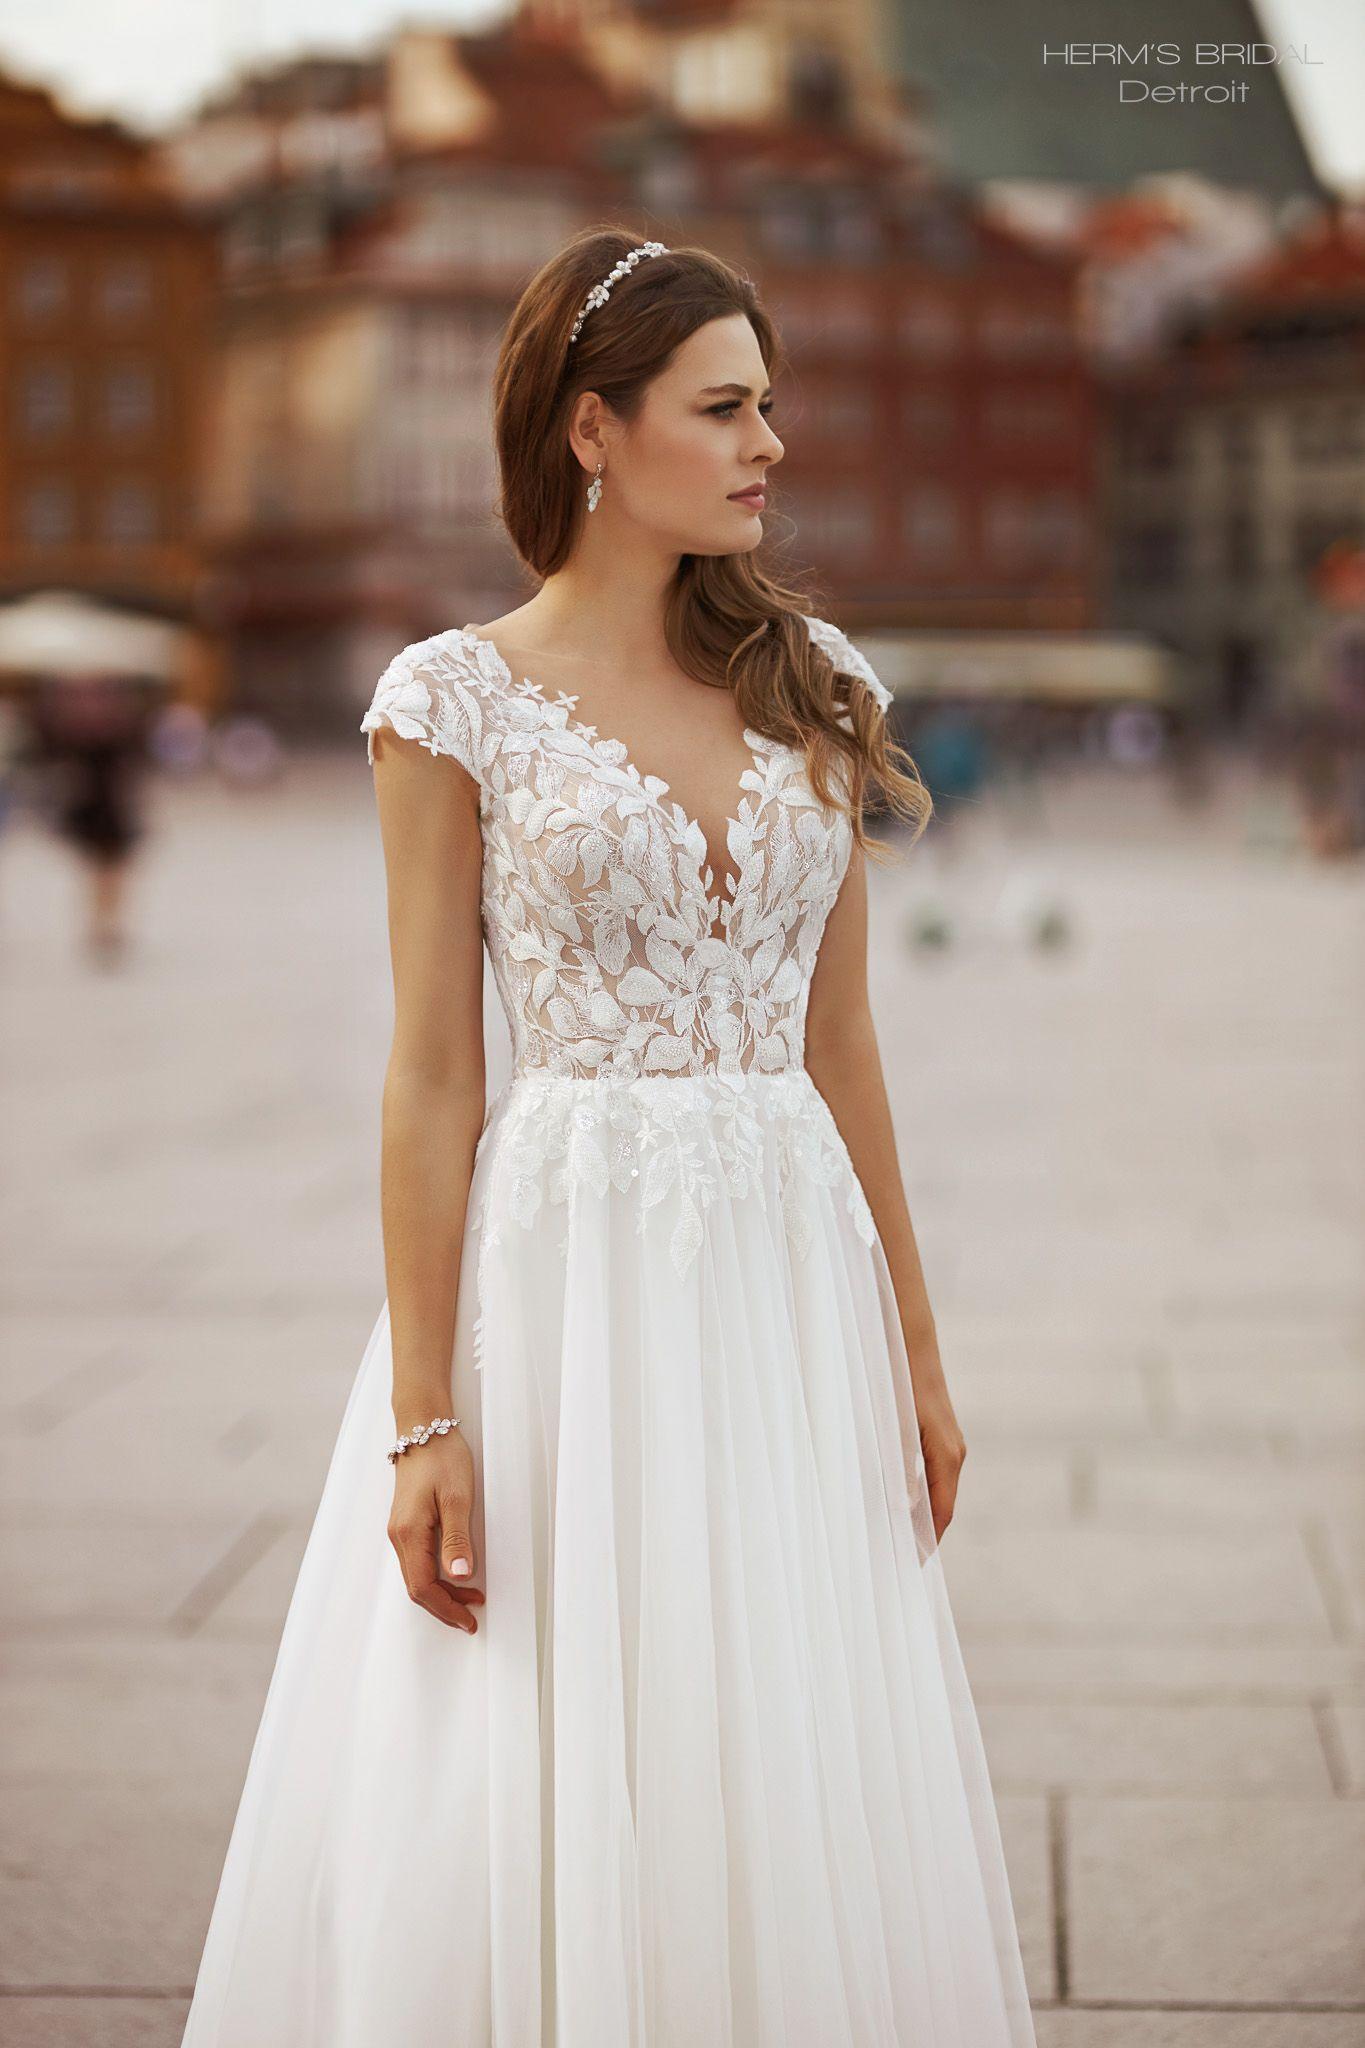 suknia slubna herms bridal Detroit 3